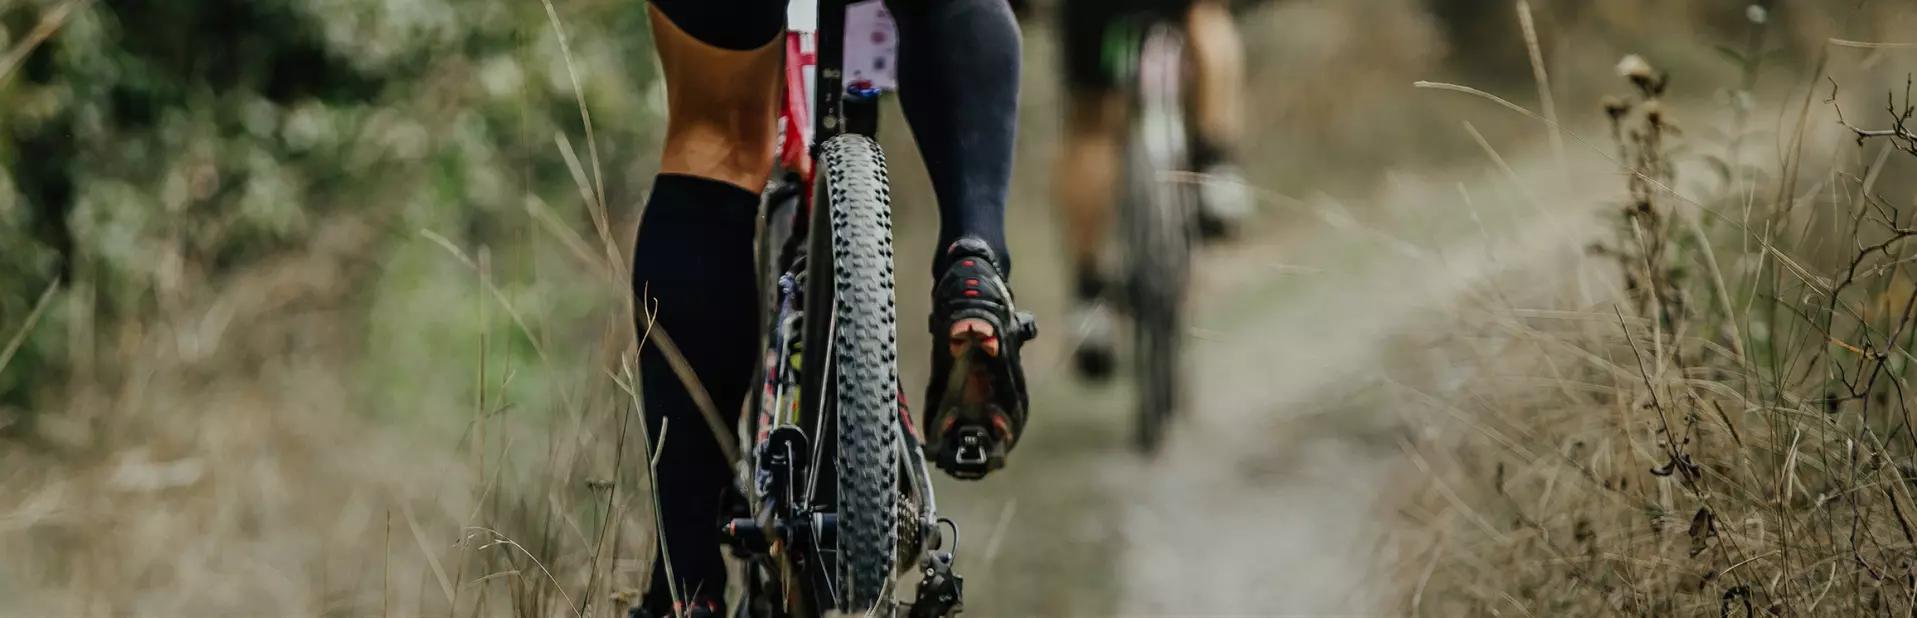 mountainbike-hardtail-senger-neo-header.webp